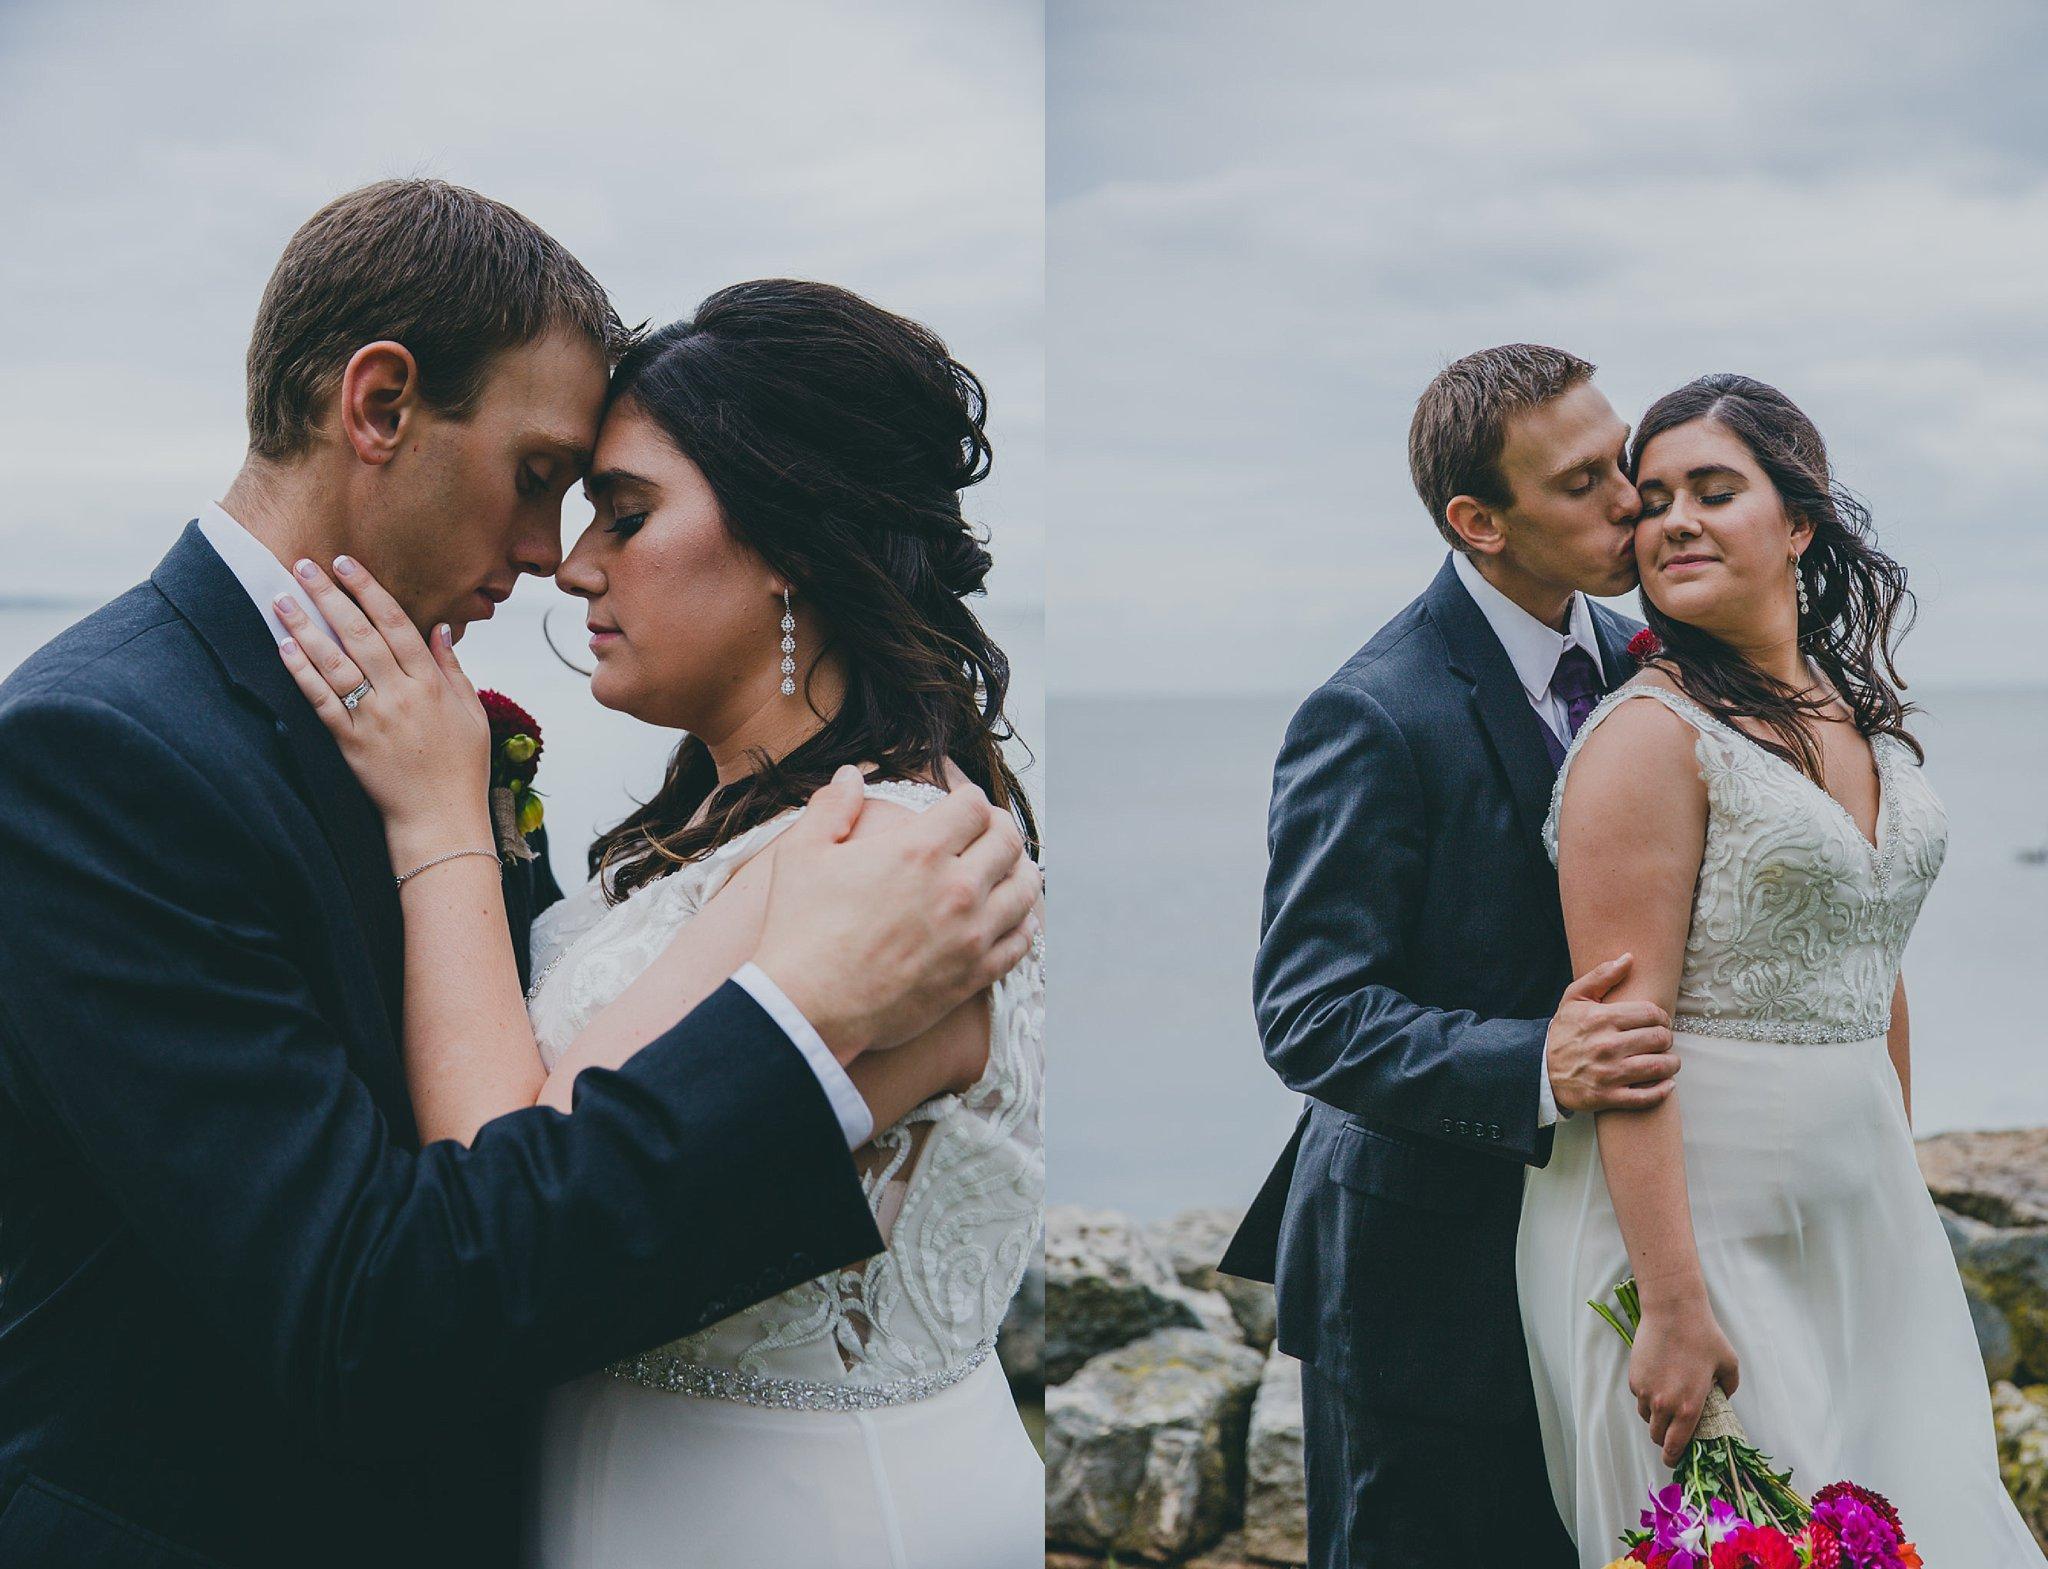 rainy wedding day photography wisconsin